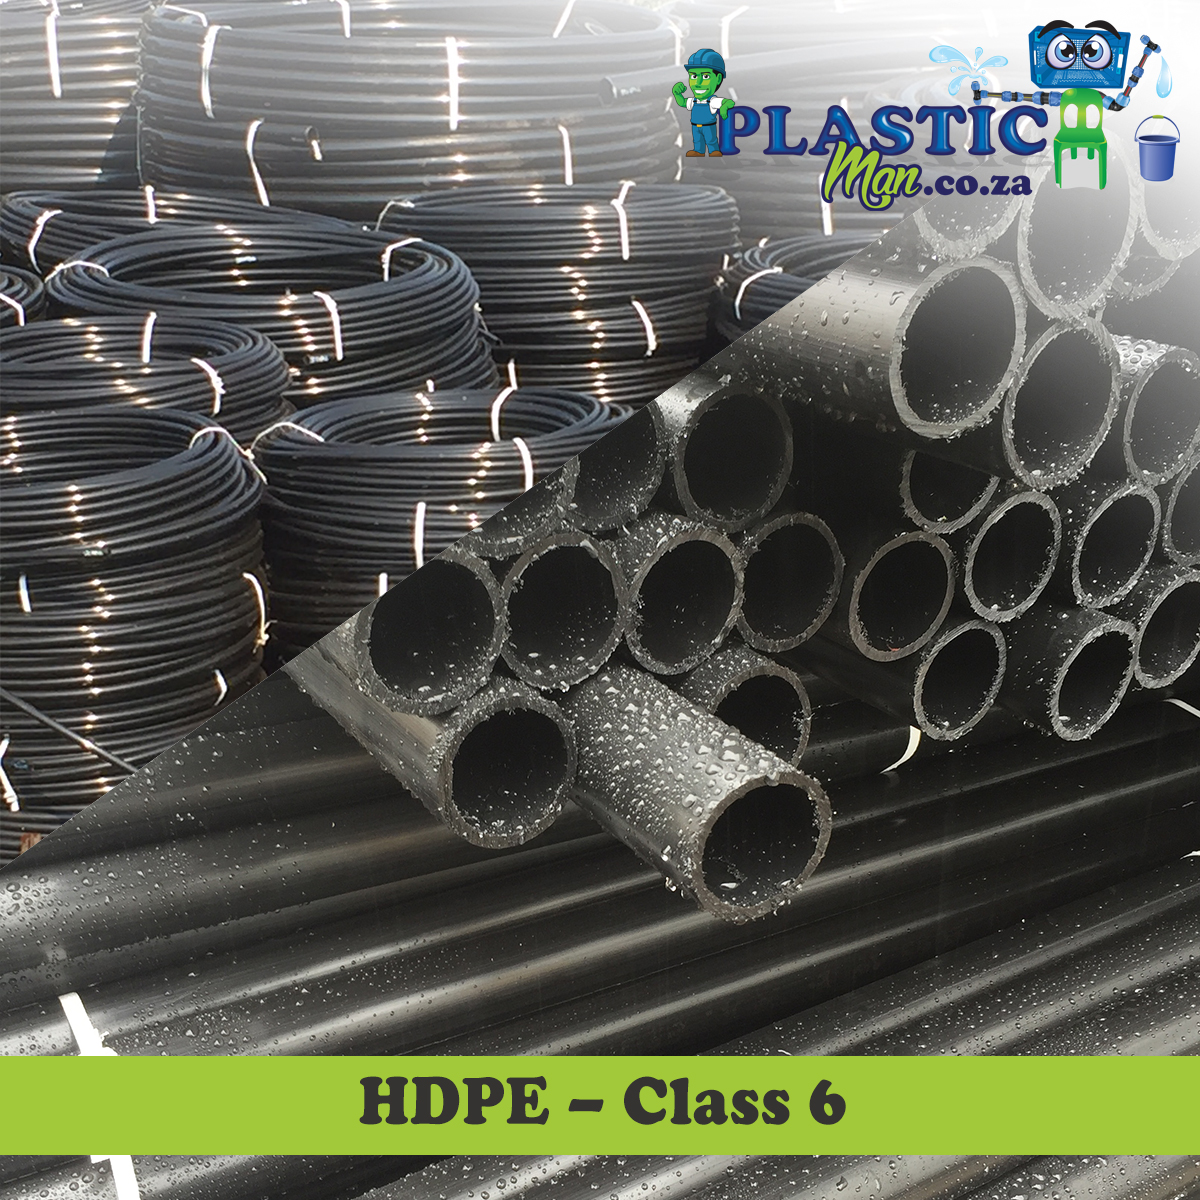 Plasticman HDPE Class 6 pipe